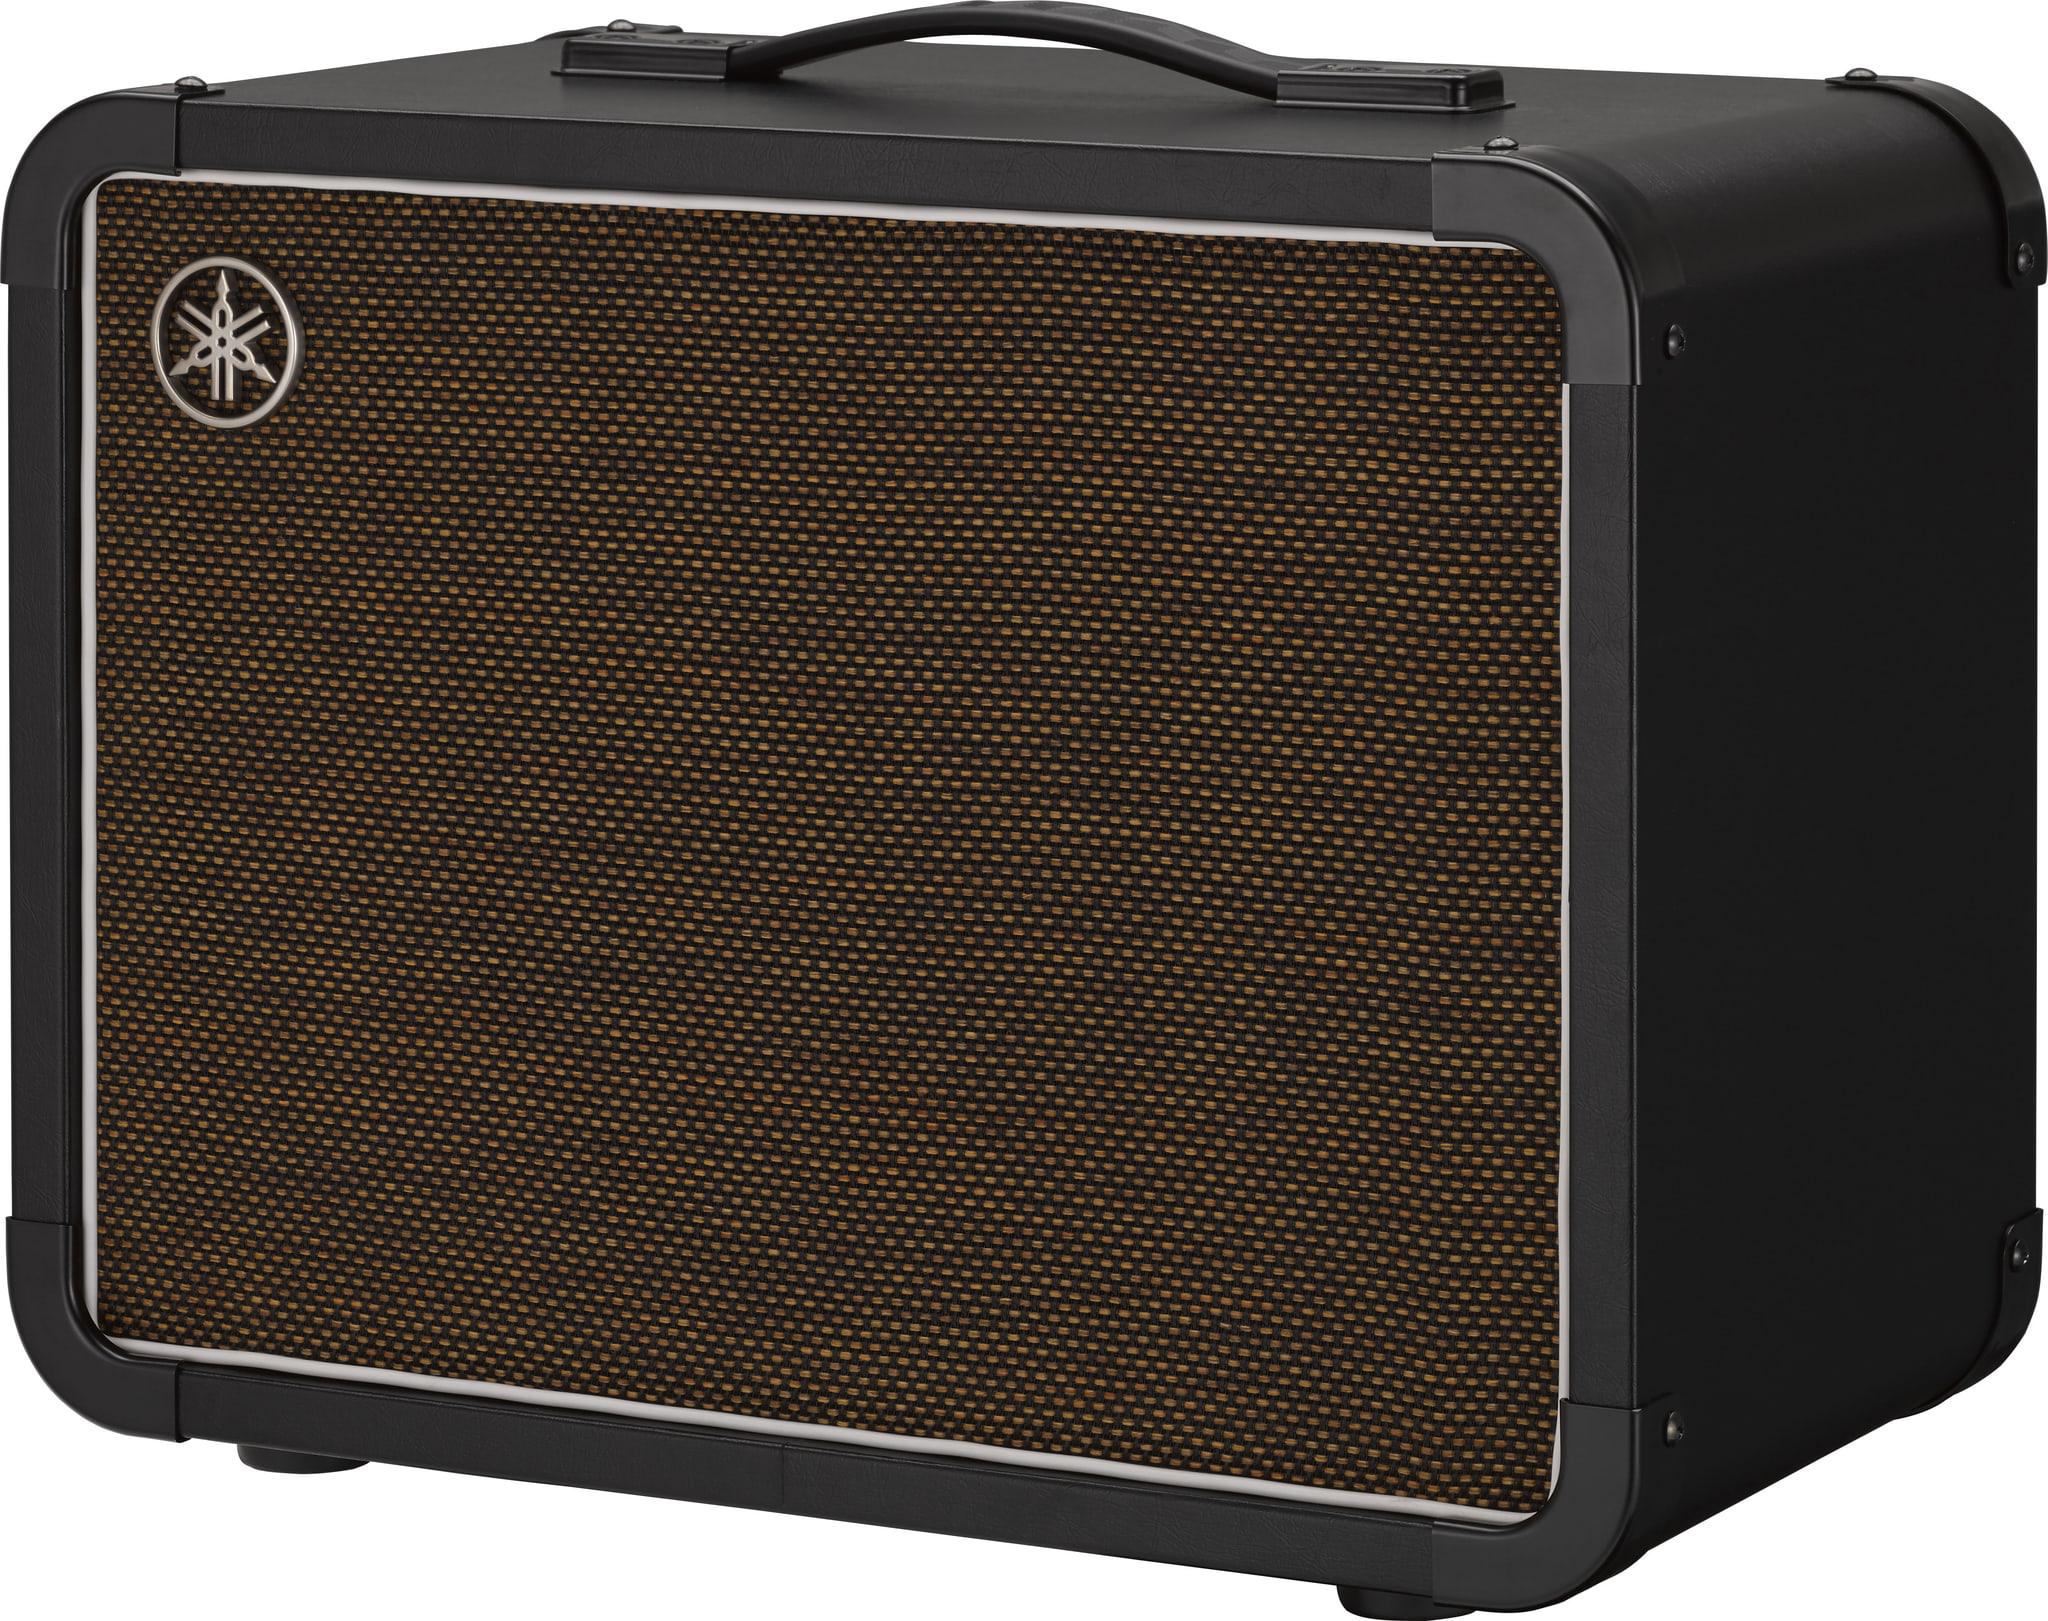 Jual yamaha ampli amplifier tabung thrc112 thr series for Yamaha thr amplifier